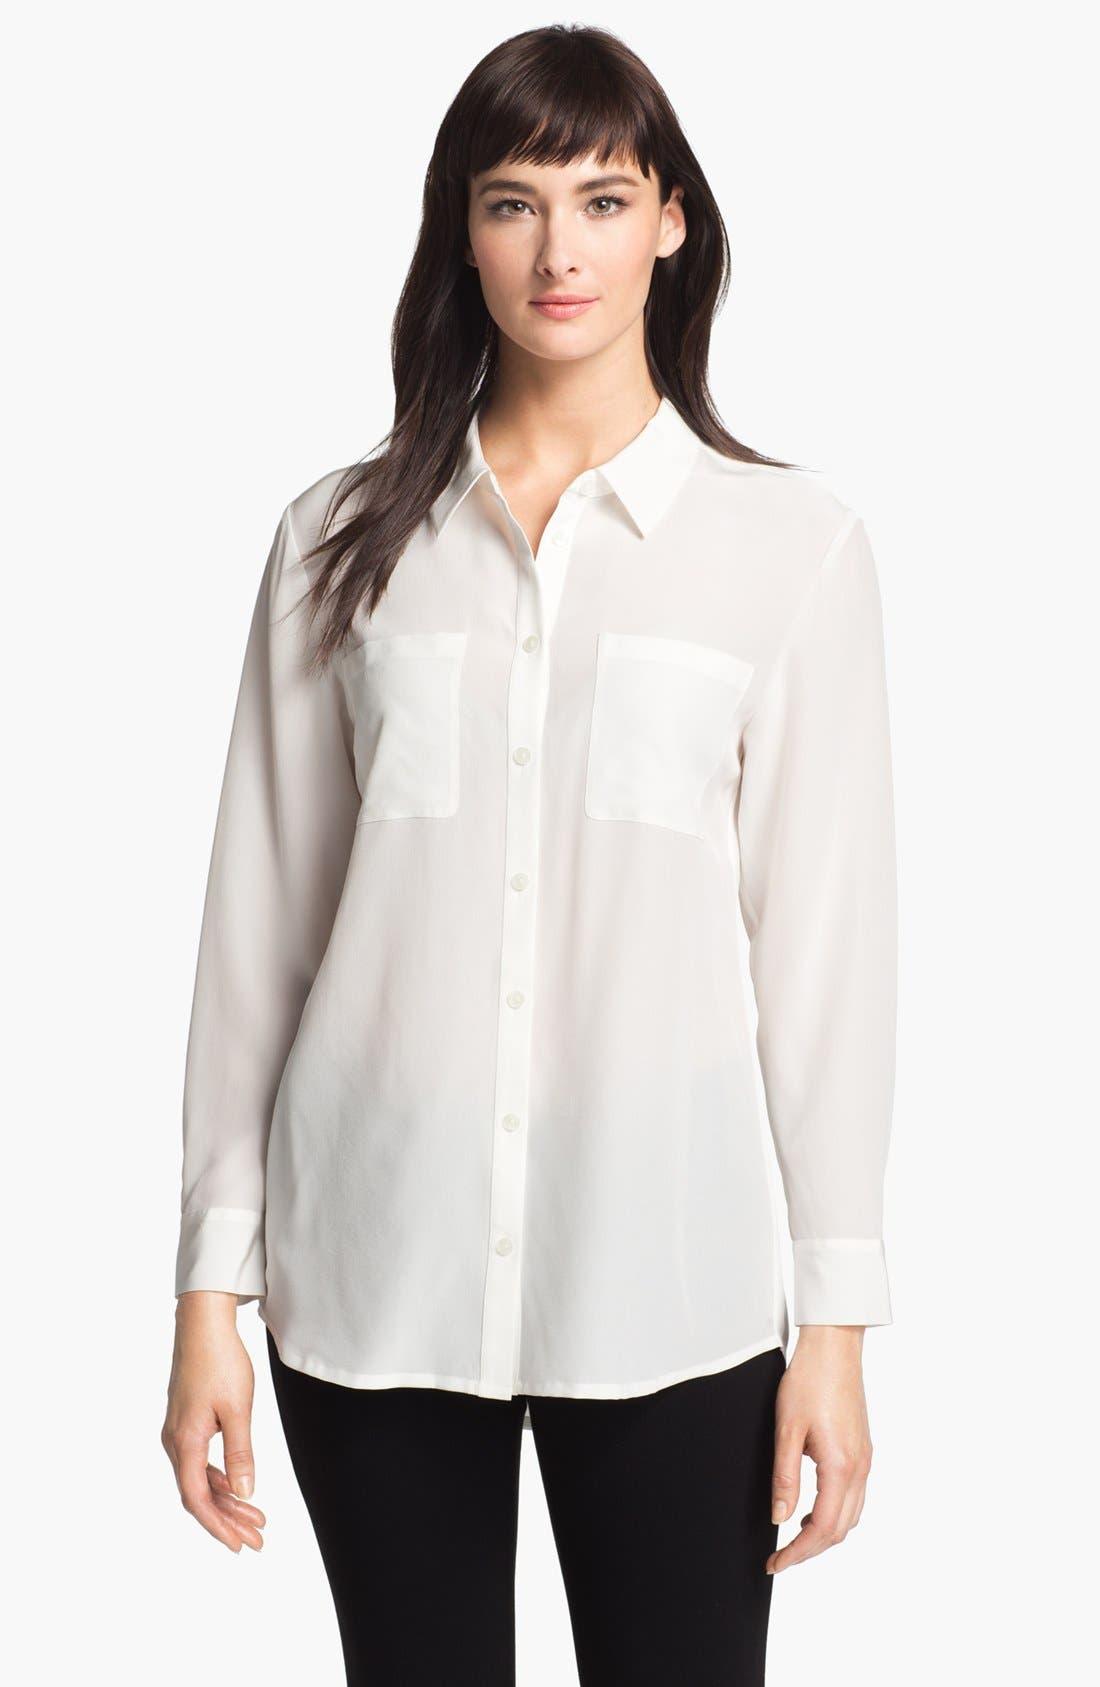 Alternate Image 1 Selected - Nordstrom Collection 'Novita' Silk Tunic Shirt